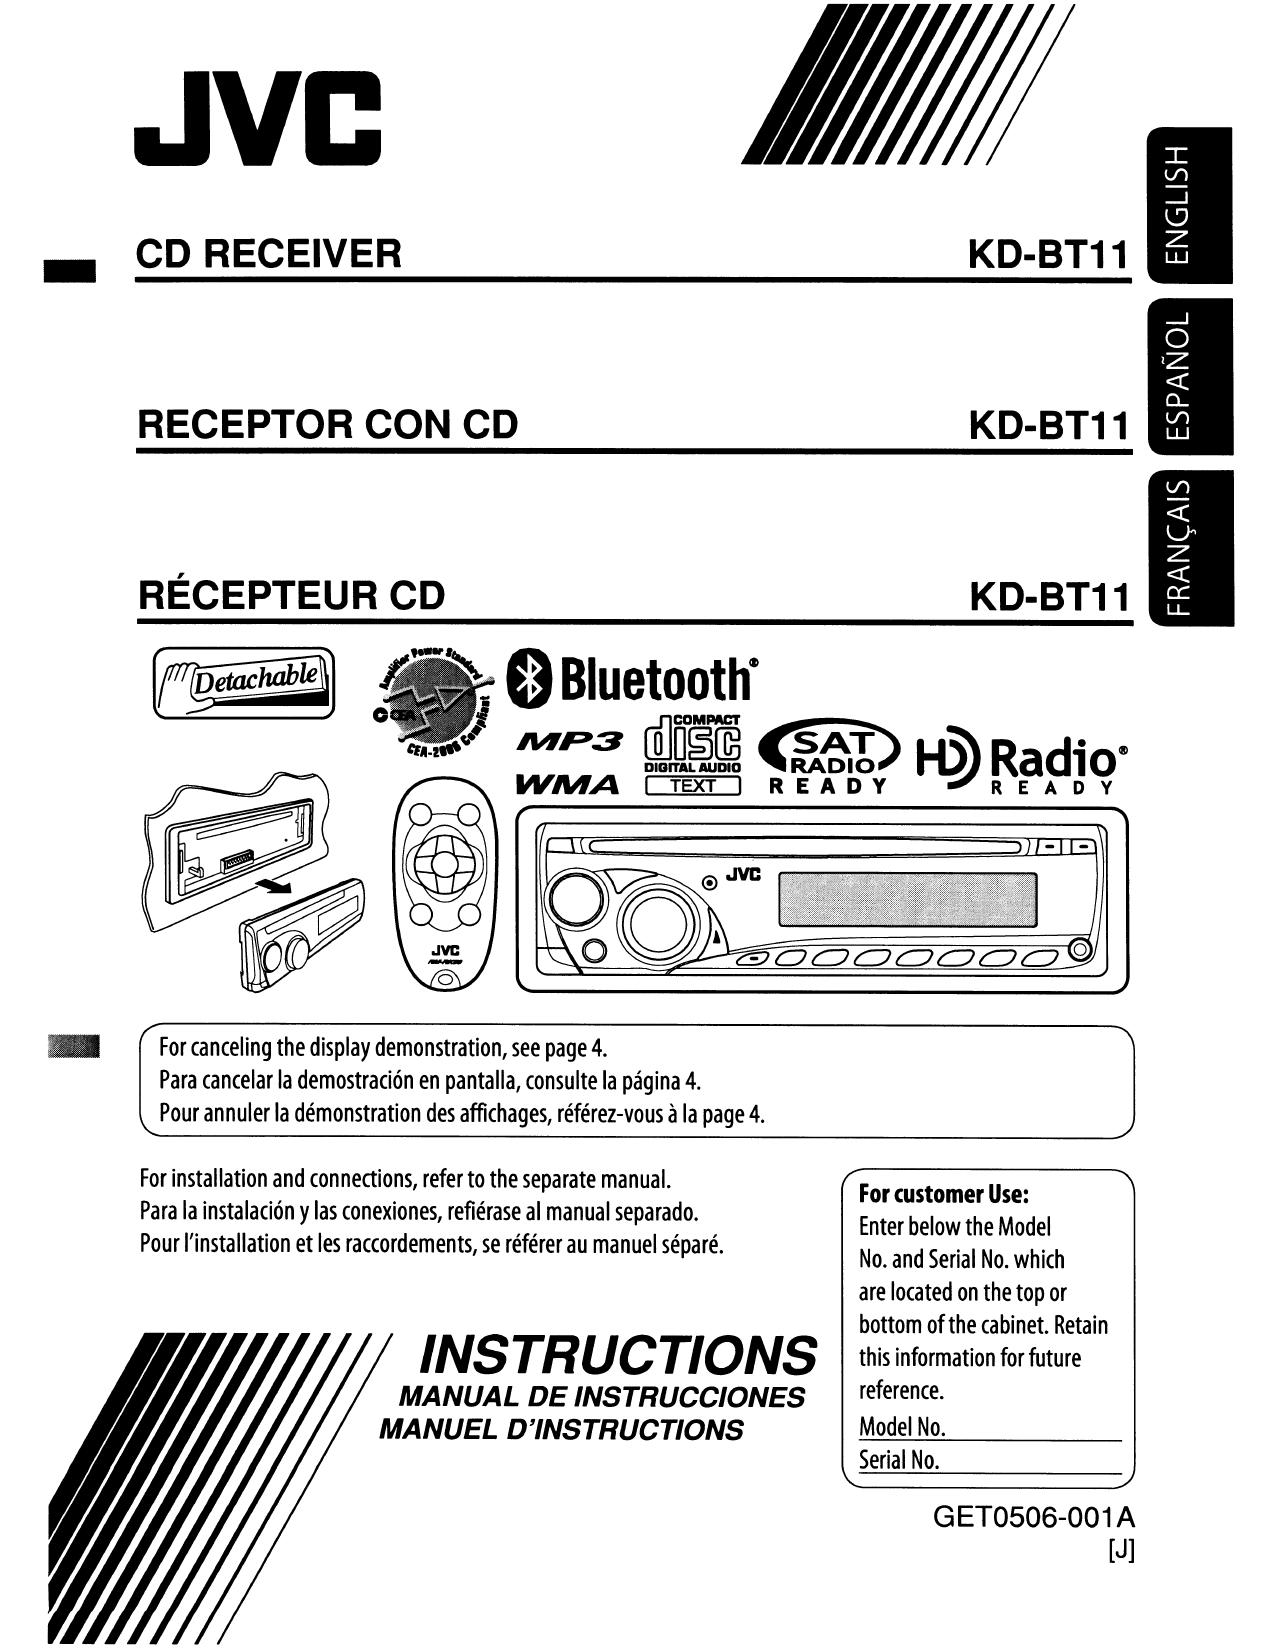 download free pdf for jvc kd bt11 car receiver manual rh umlib com jvc kd-bt11 installation manual JVC Car Radio Manual